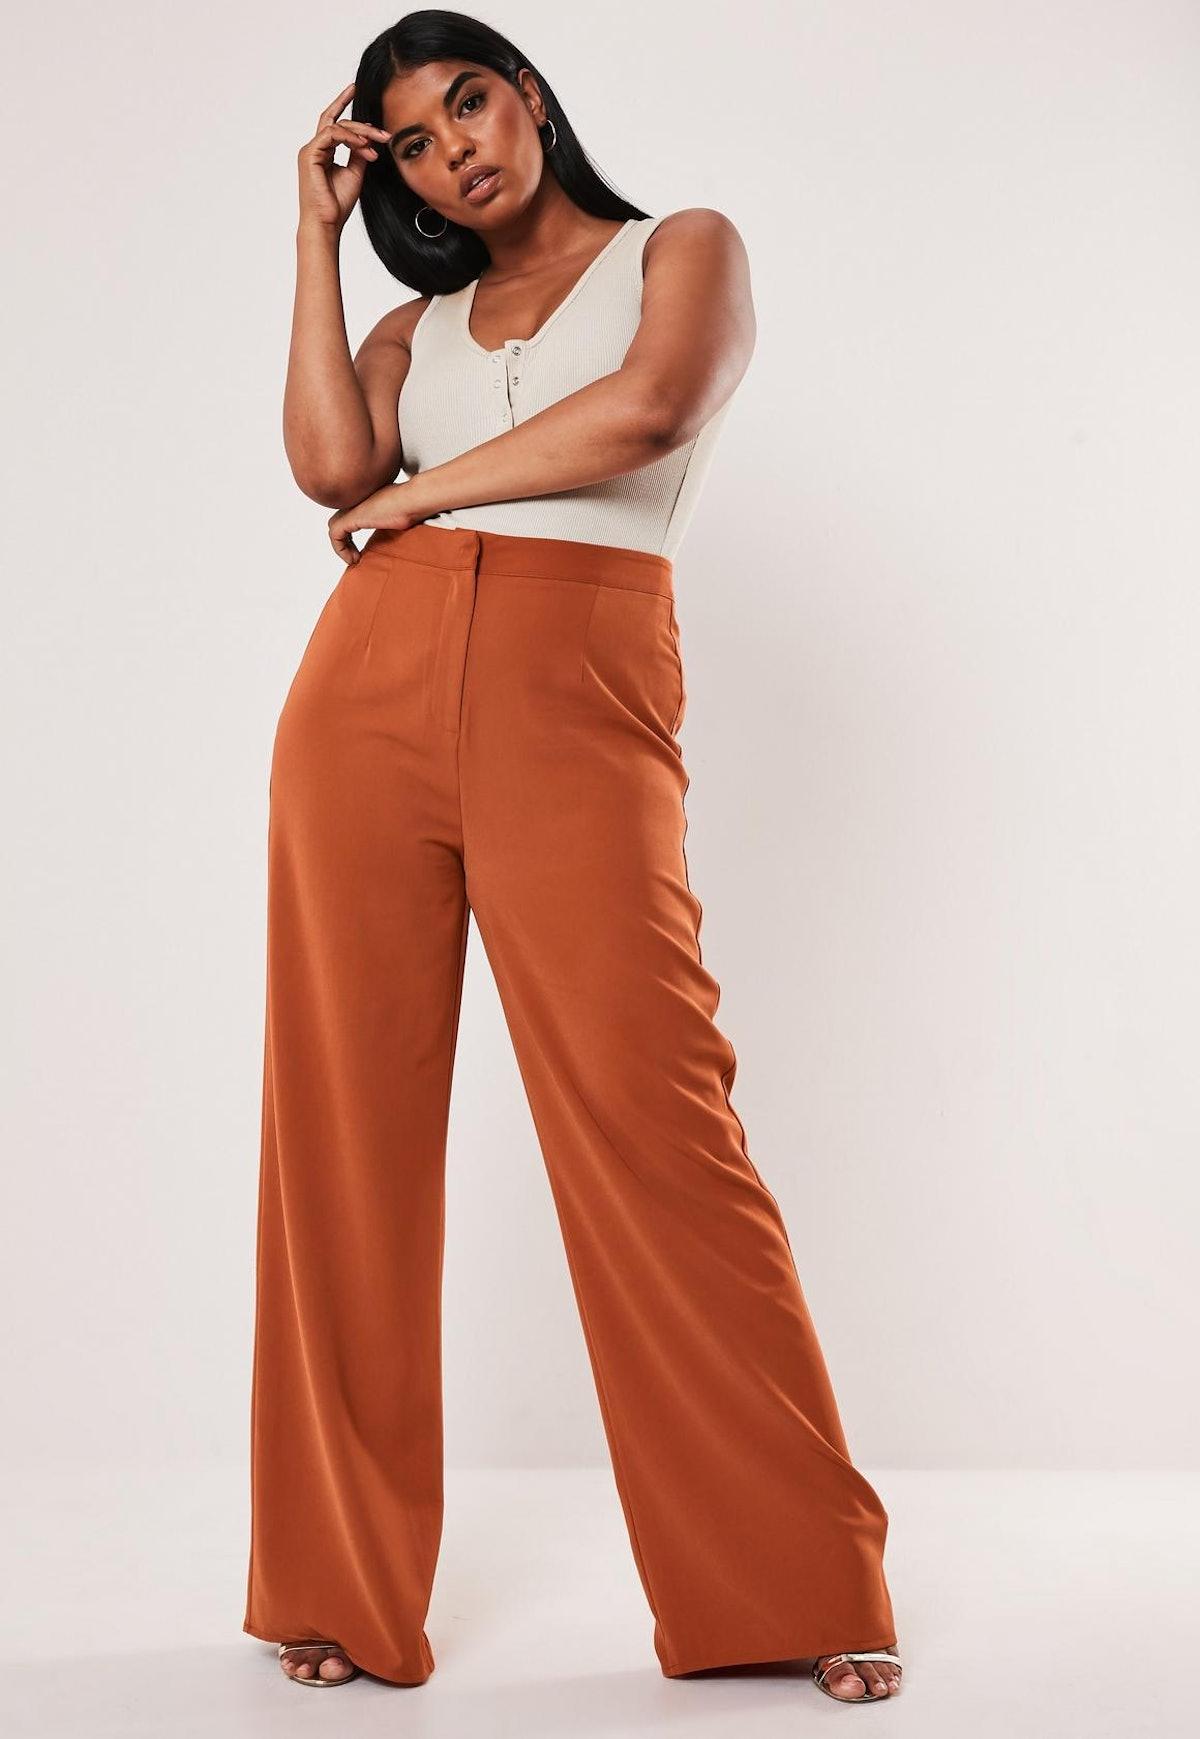 Plus Size Terracotta Co Ord Straight Leg Pants